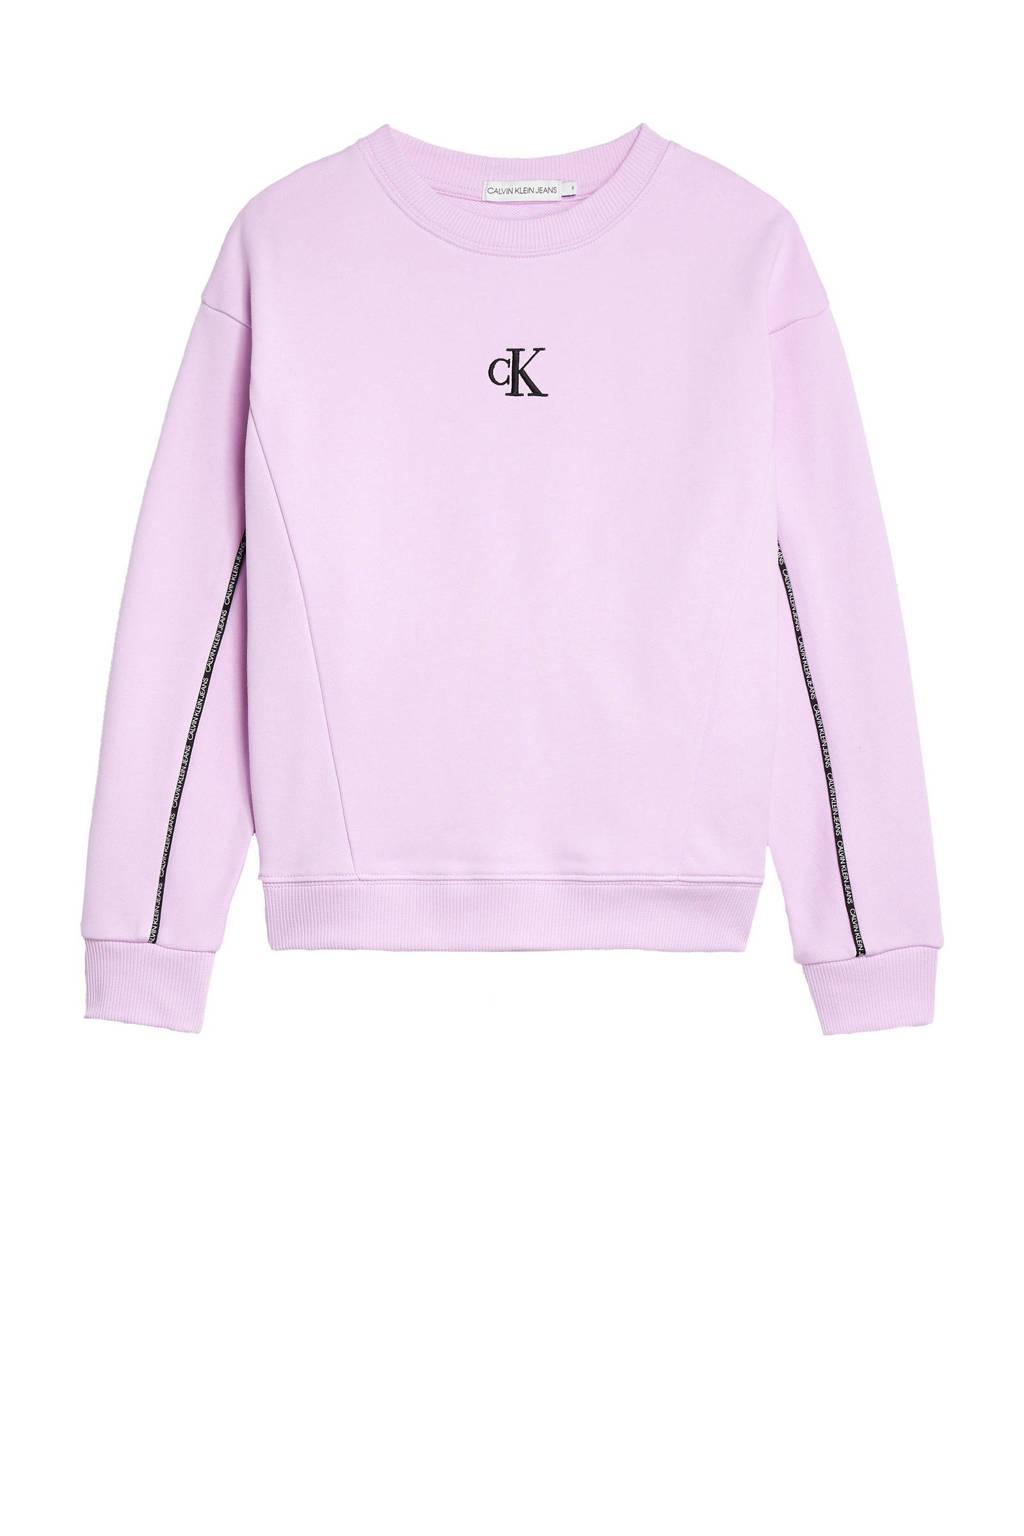 CALVIN KLEIN JEANS sweater met contrastbies lila/zwart/wit, Lila/Zwart/Wit